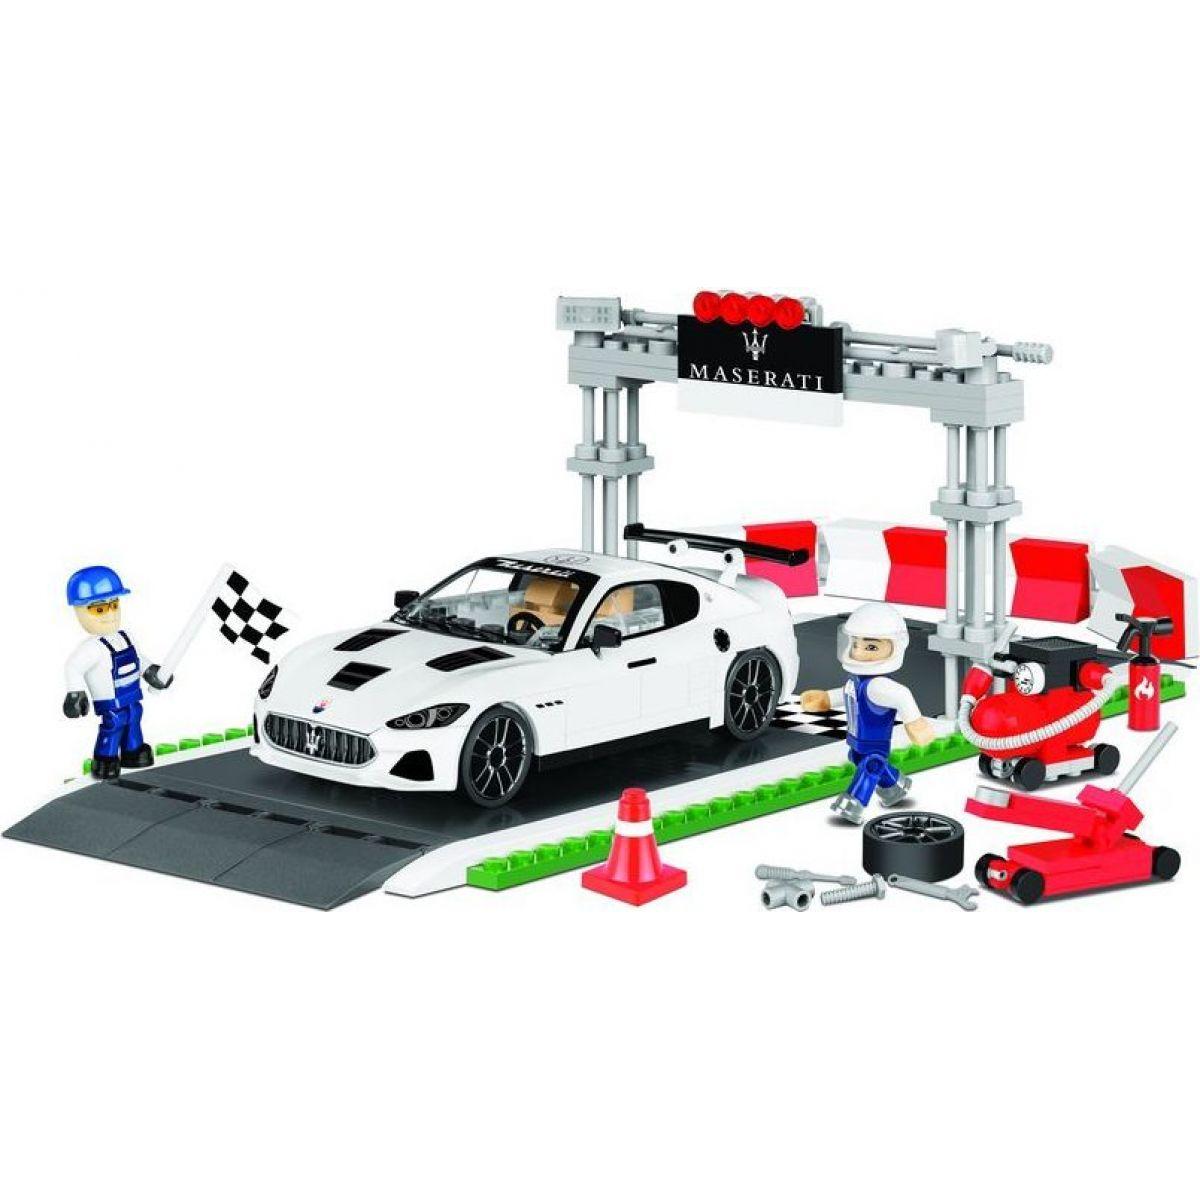 Cobi Maserati Gran Turismo GT3 Racing set